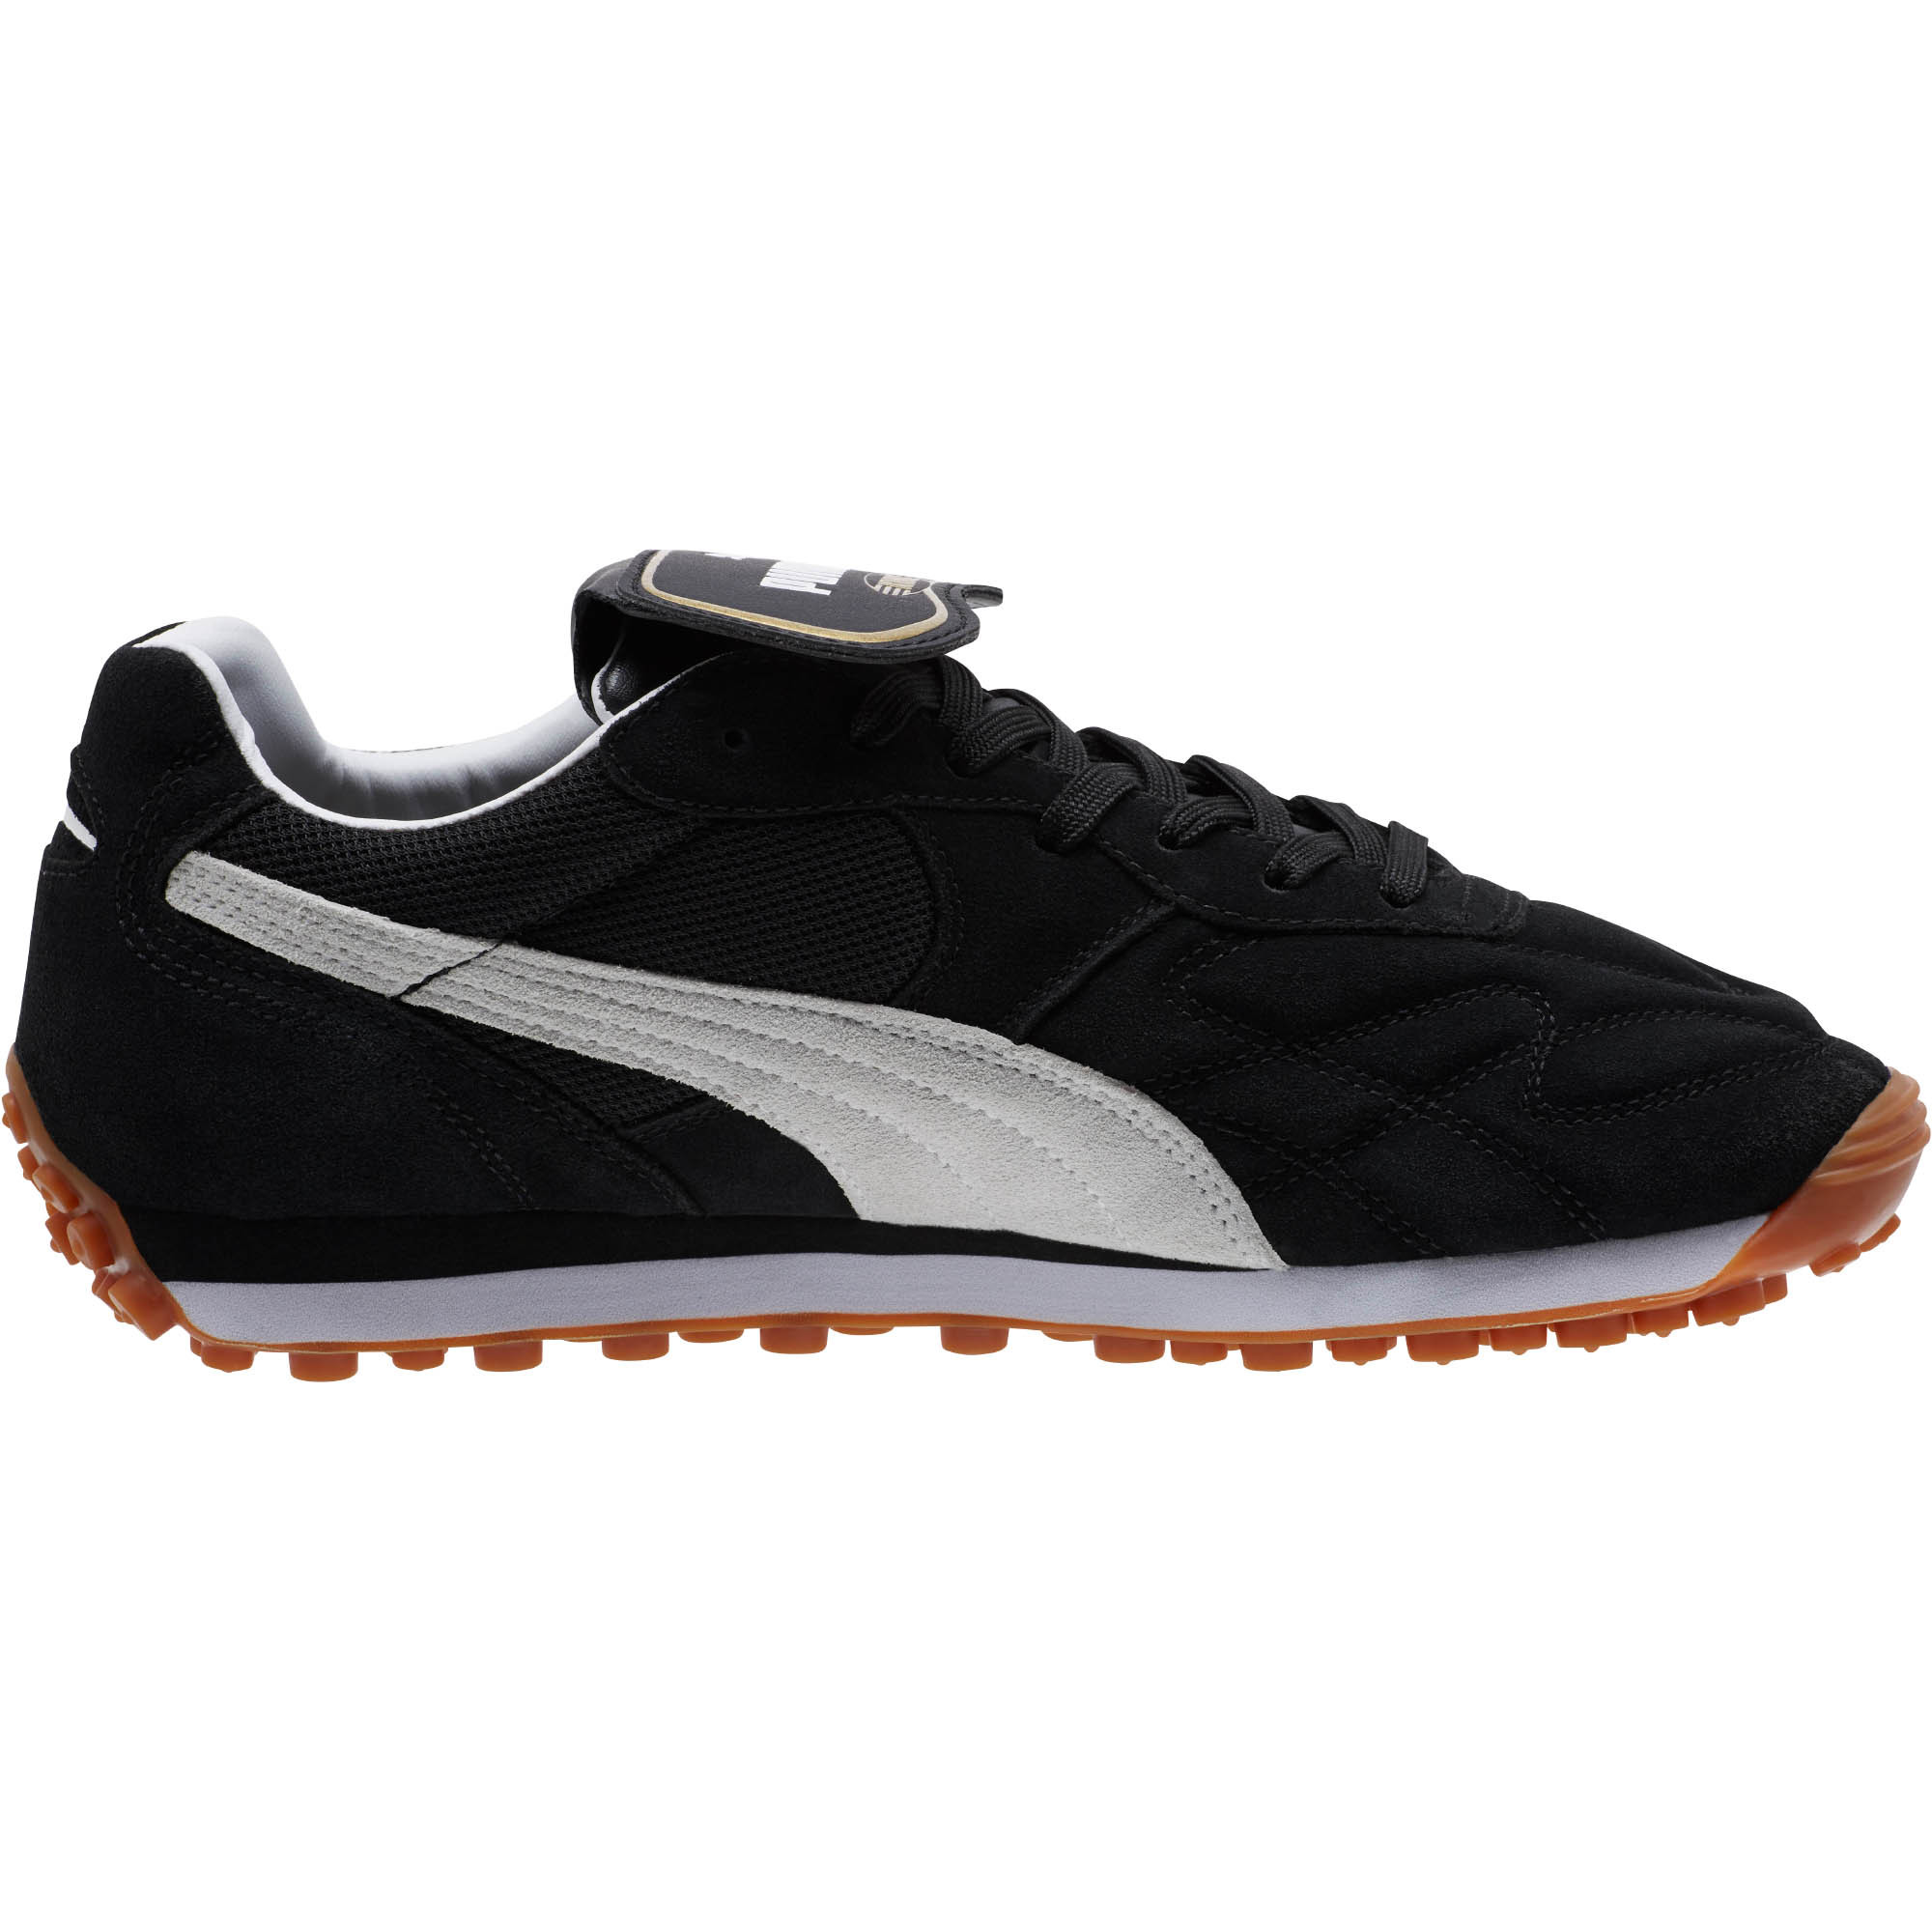 PUMA-King-Avanti-Soccer-Cleats-Unisex-Shoe-Sport-Classics thumbnail 5